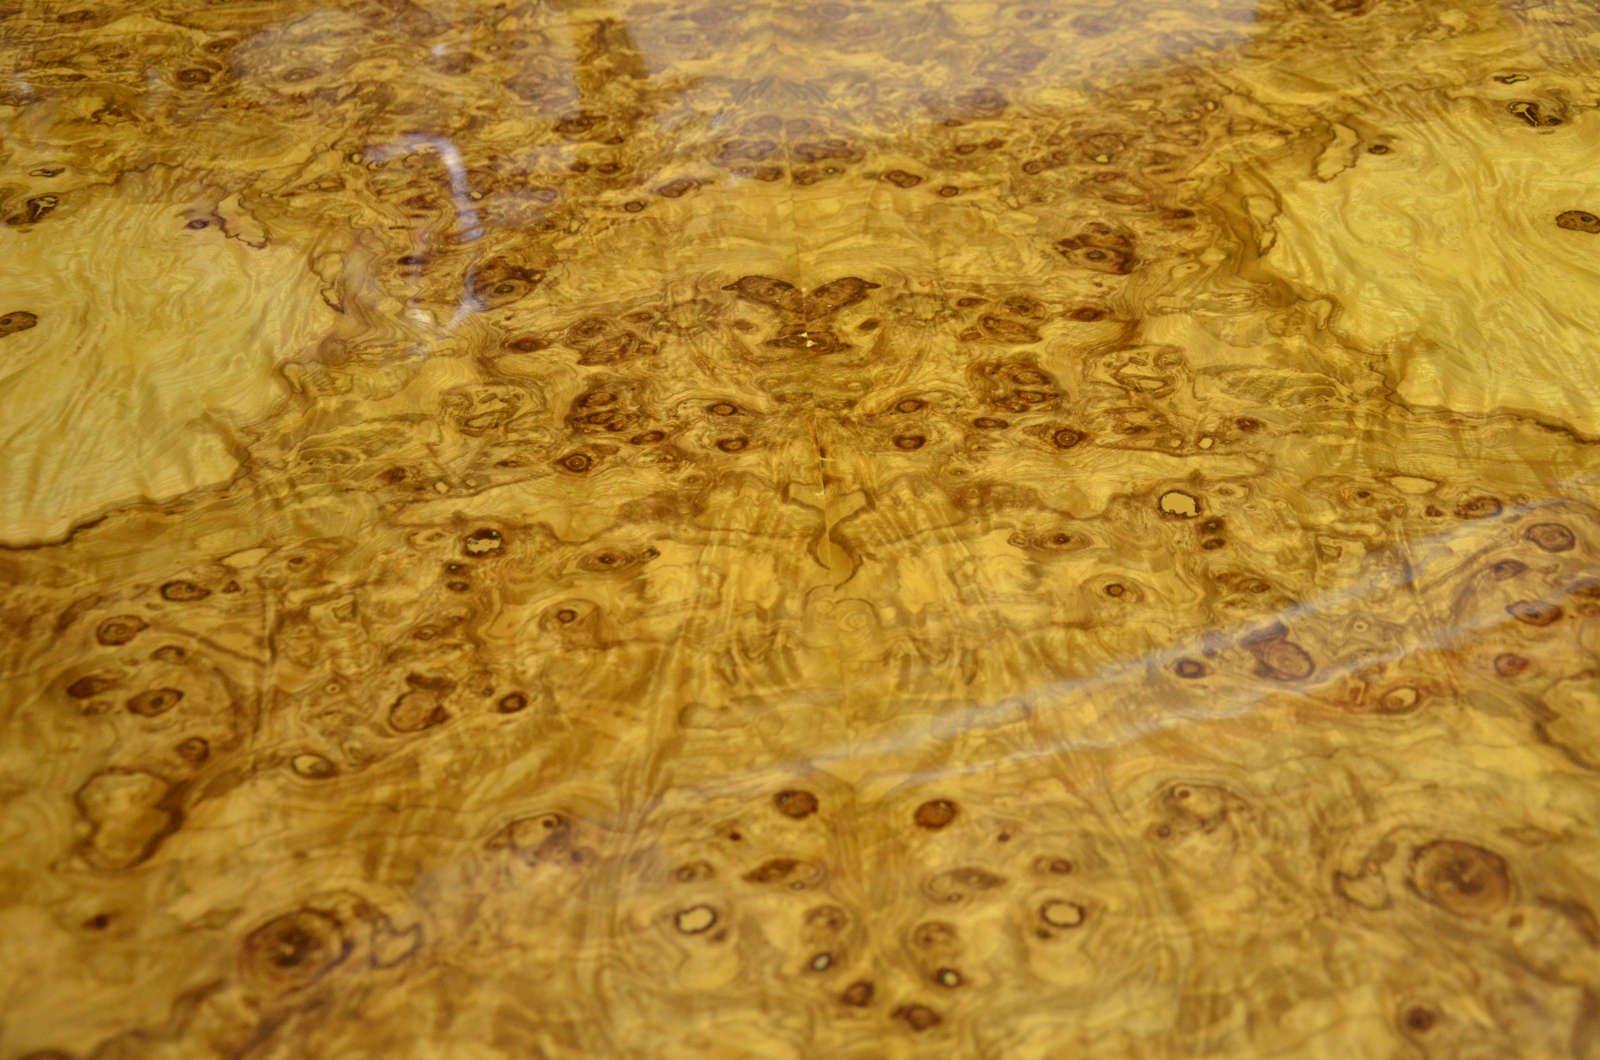 runder art deco tisch aus olivenholz wurzelholz 1920 bei pamono kaufen. Black Bedroom Furniture Sets. Home Design Ideas